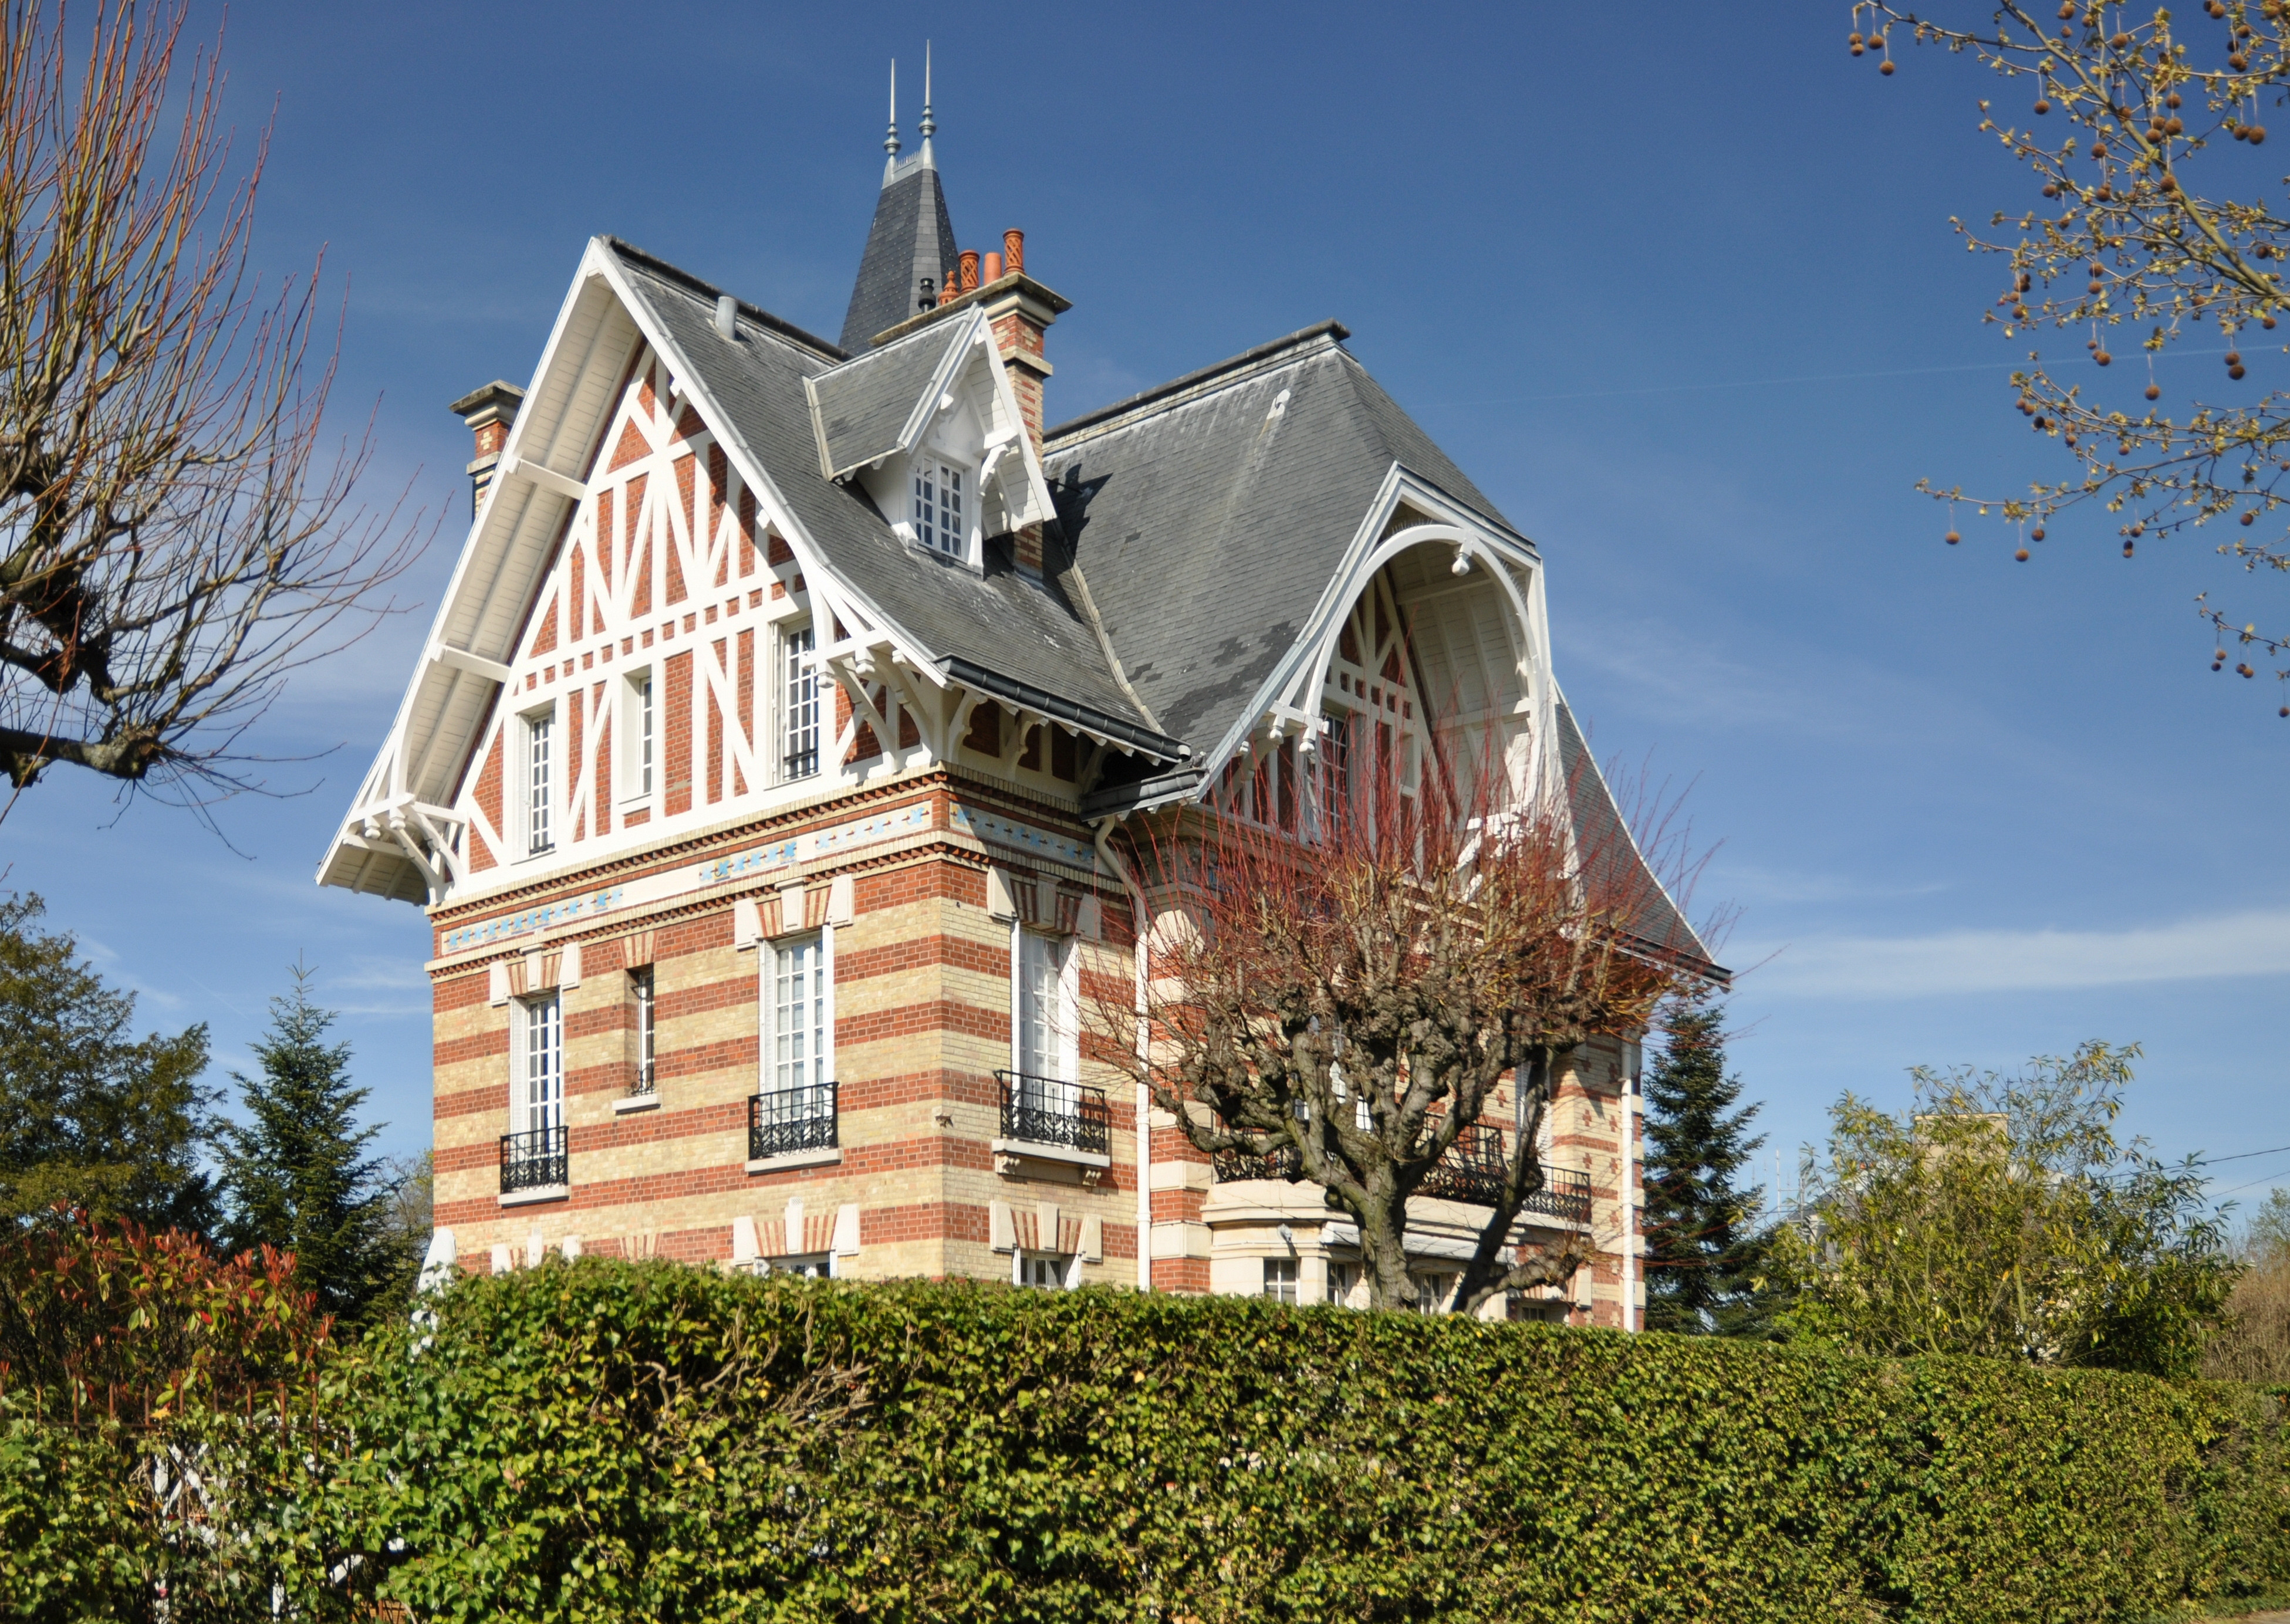 file house in le v sinet 018 jpg wikimedia commons. Black Bedroom Furniture Sets. Home Design Ideas